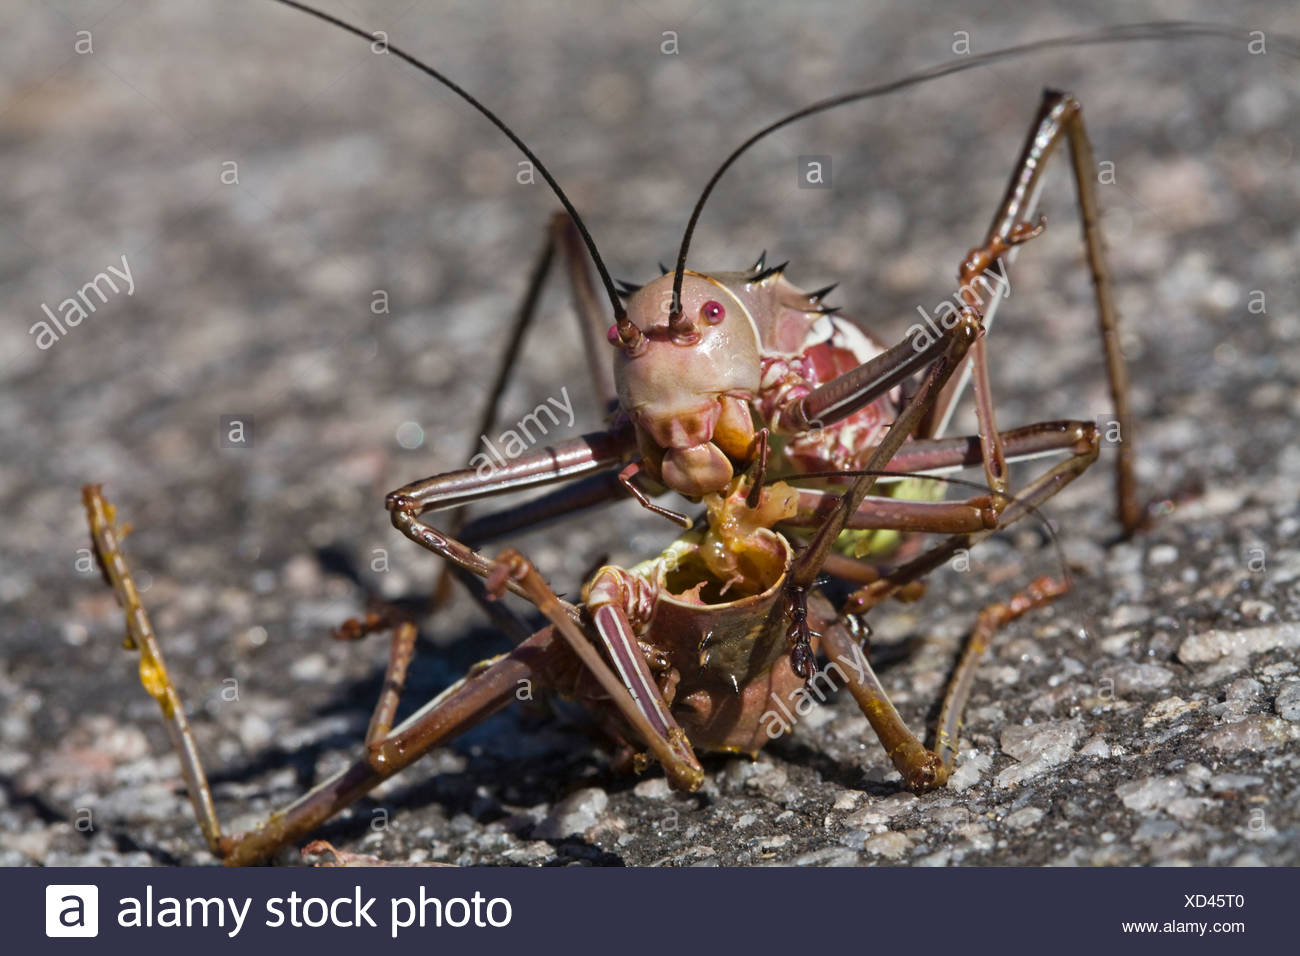 Afrika, Namibia, gepanzerten Cricket (Tettigoniidae), Nahaufnahme Stockbild